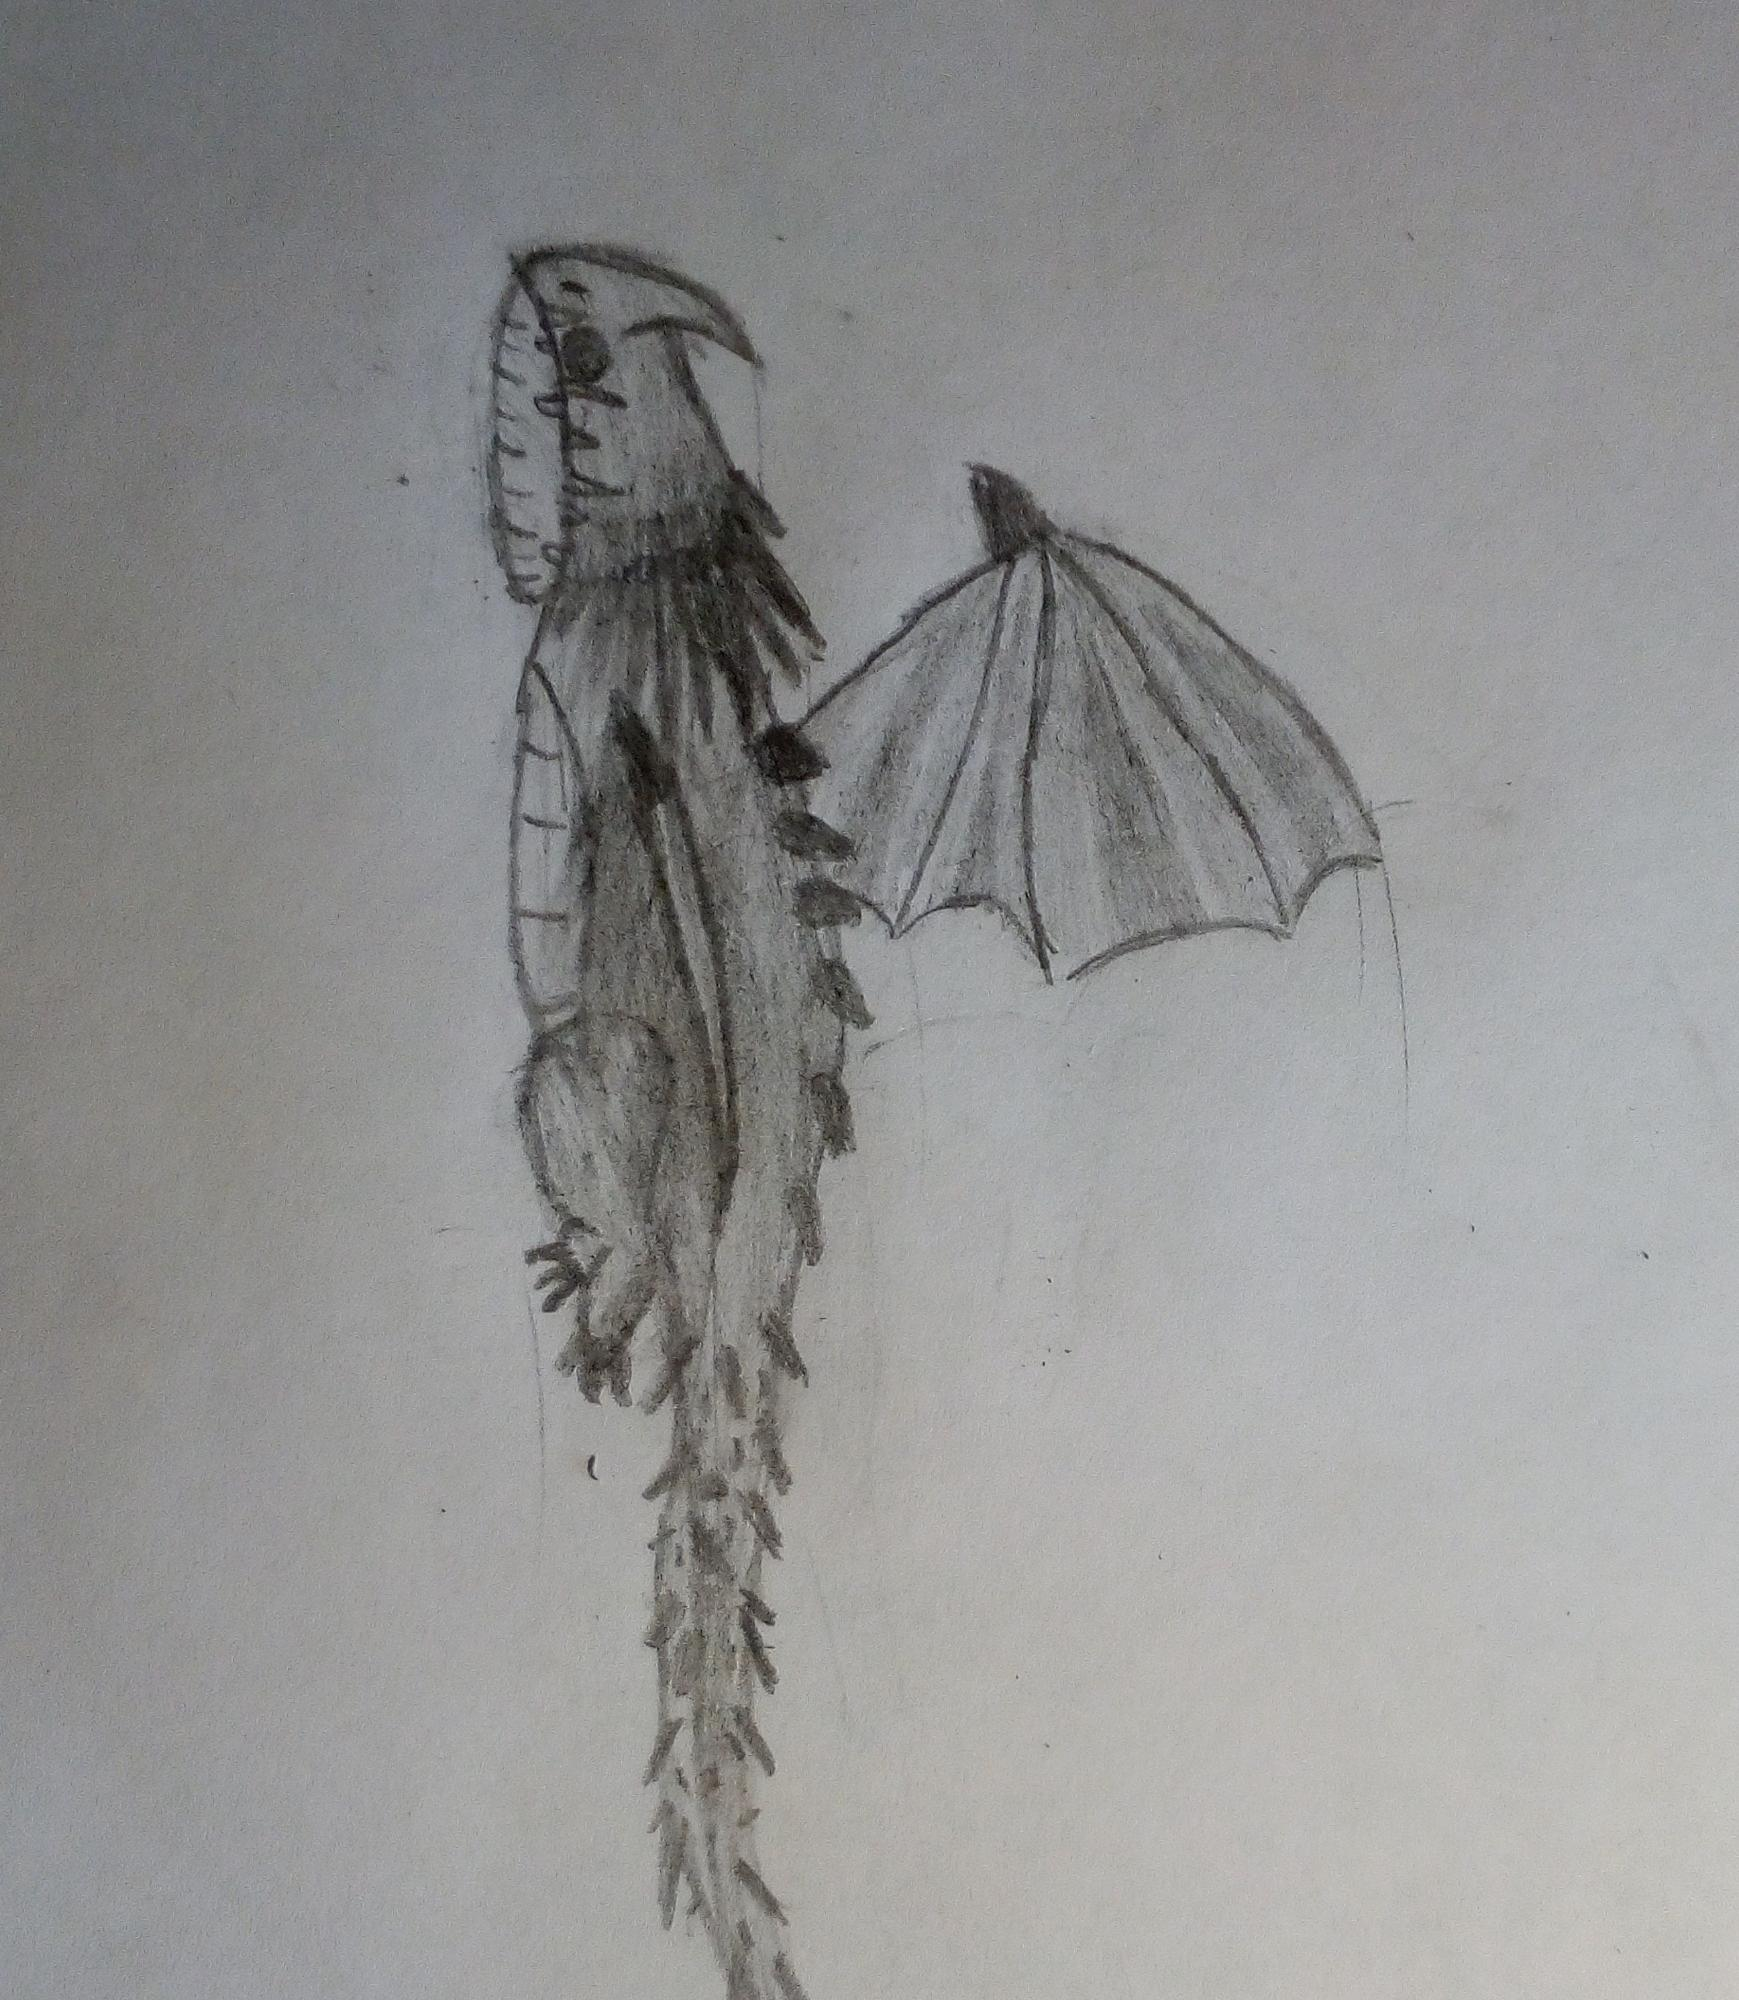 Aquí el dibujo del Nadder, no me salió muy bien ,Perdón, pero lo intenté 😅